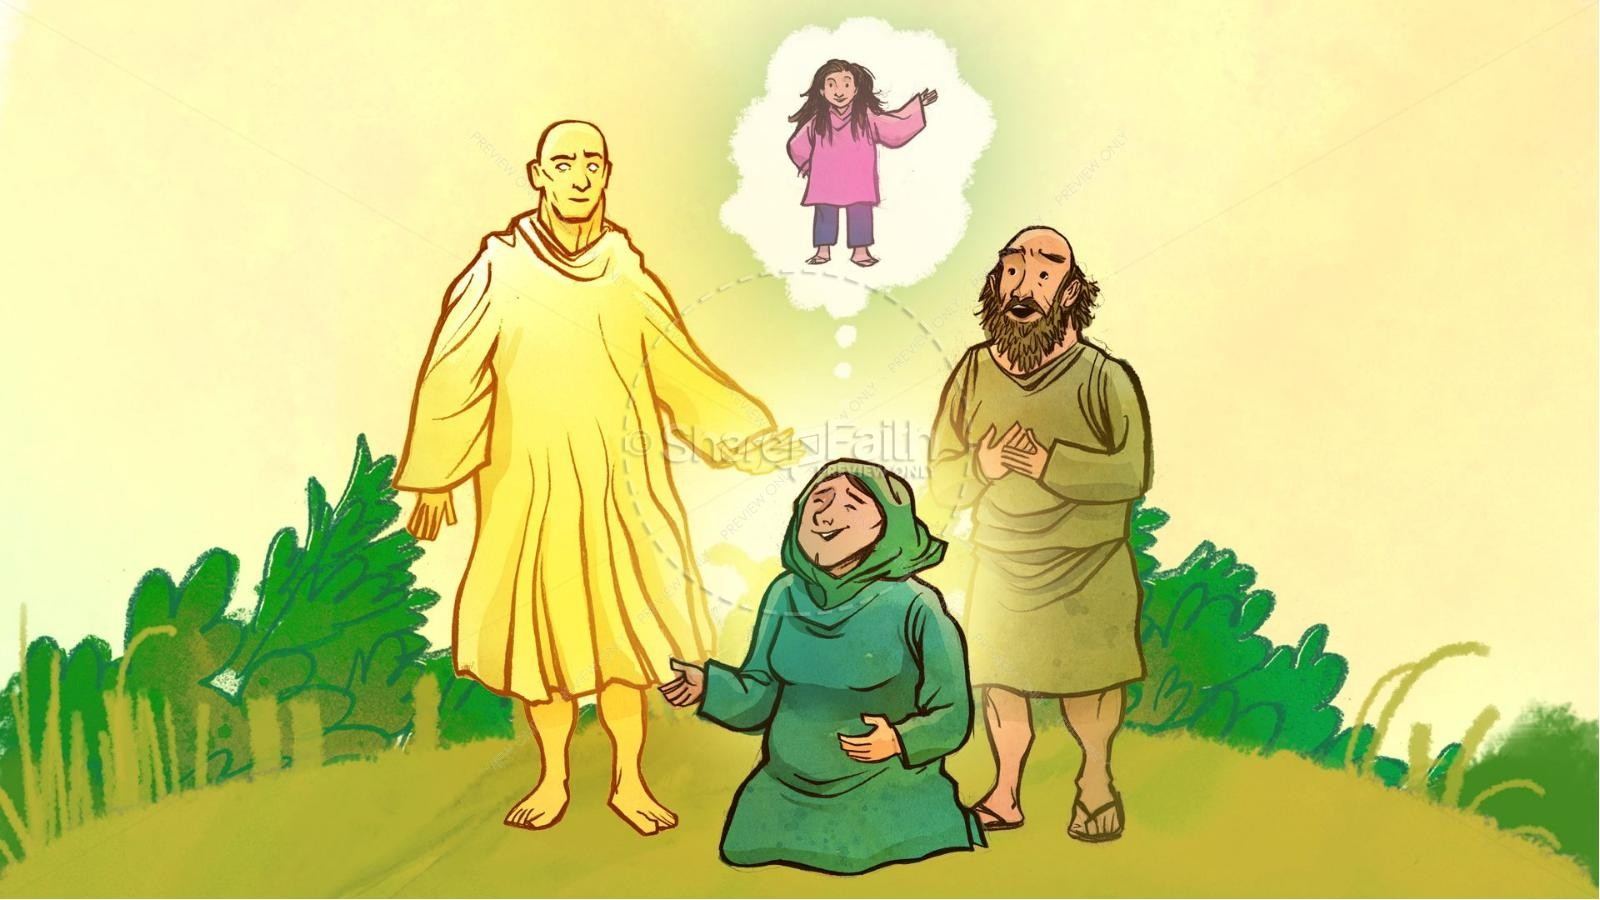 Samson and Delilah Kids Bible Stories | Kids Bible Stories